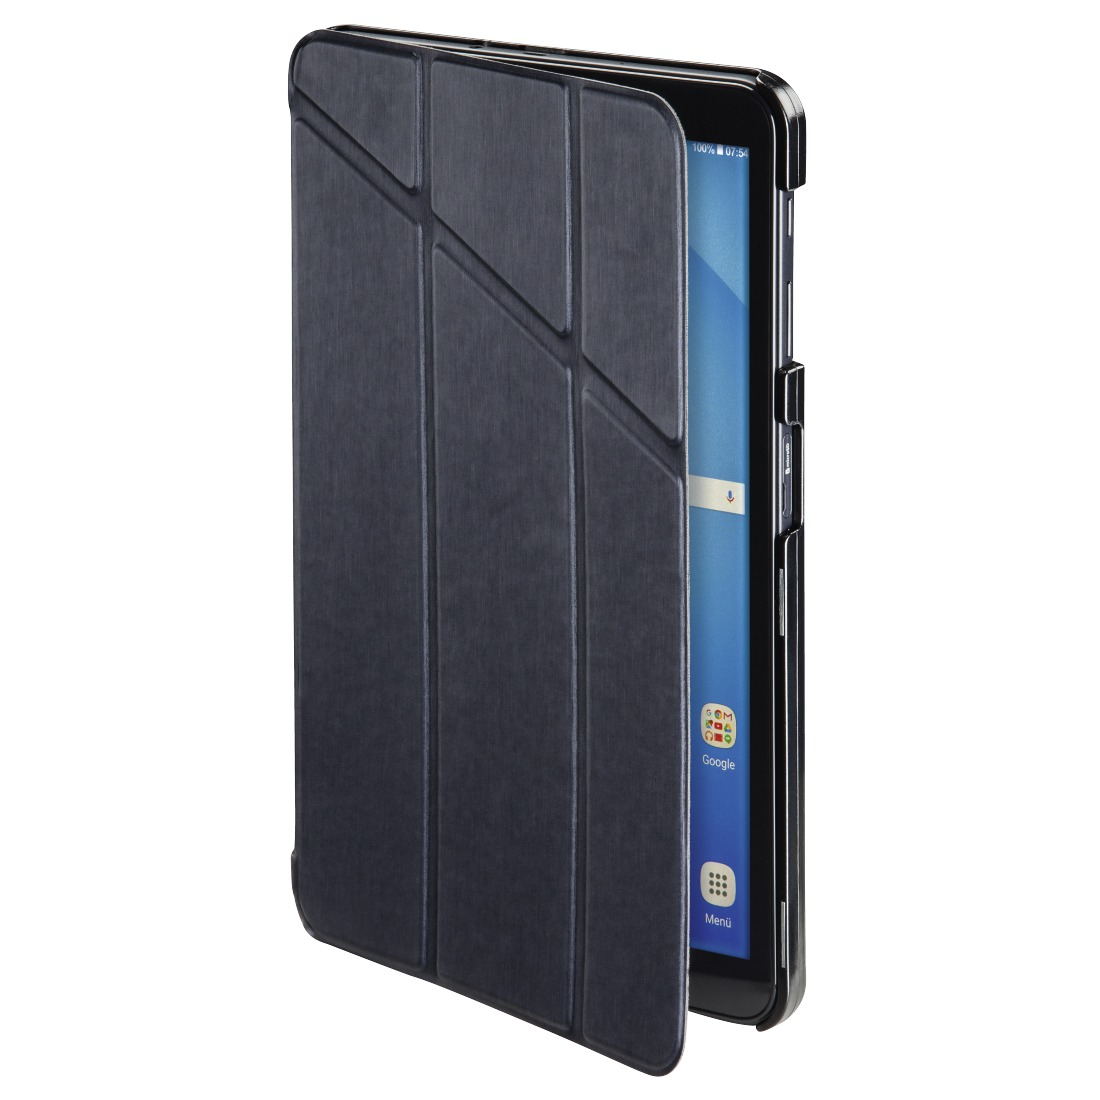 Korting Hama Portfolio 2 in 1 voor Samsung Galaxy Tab A 10.1 (2016) tablethoesje